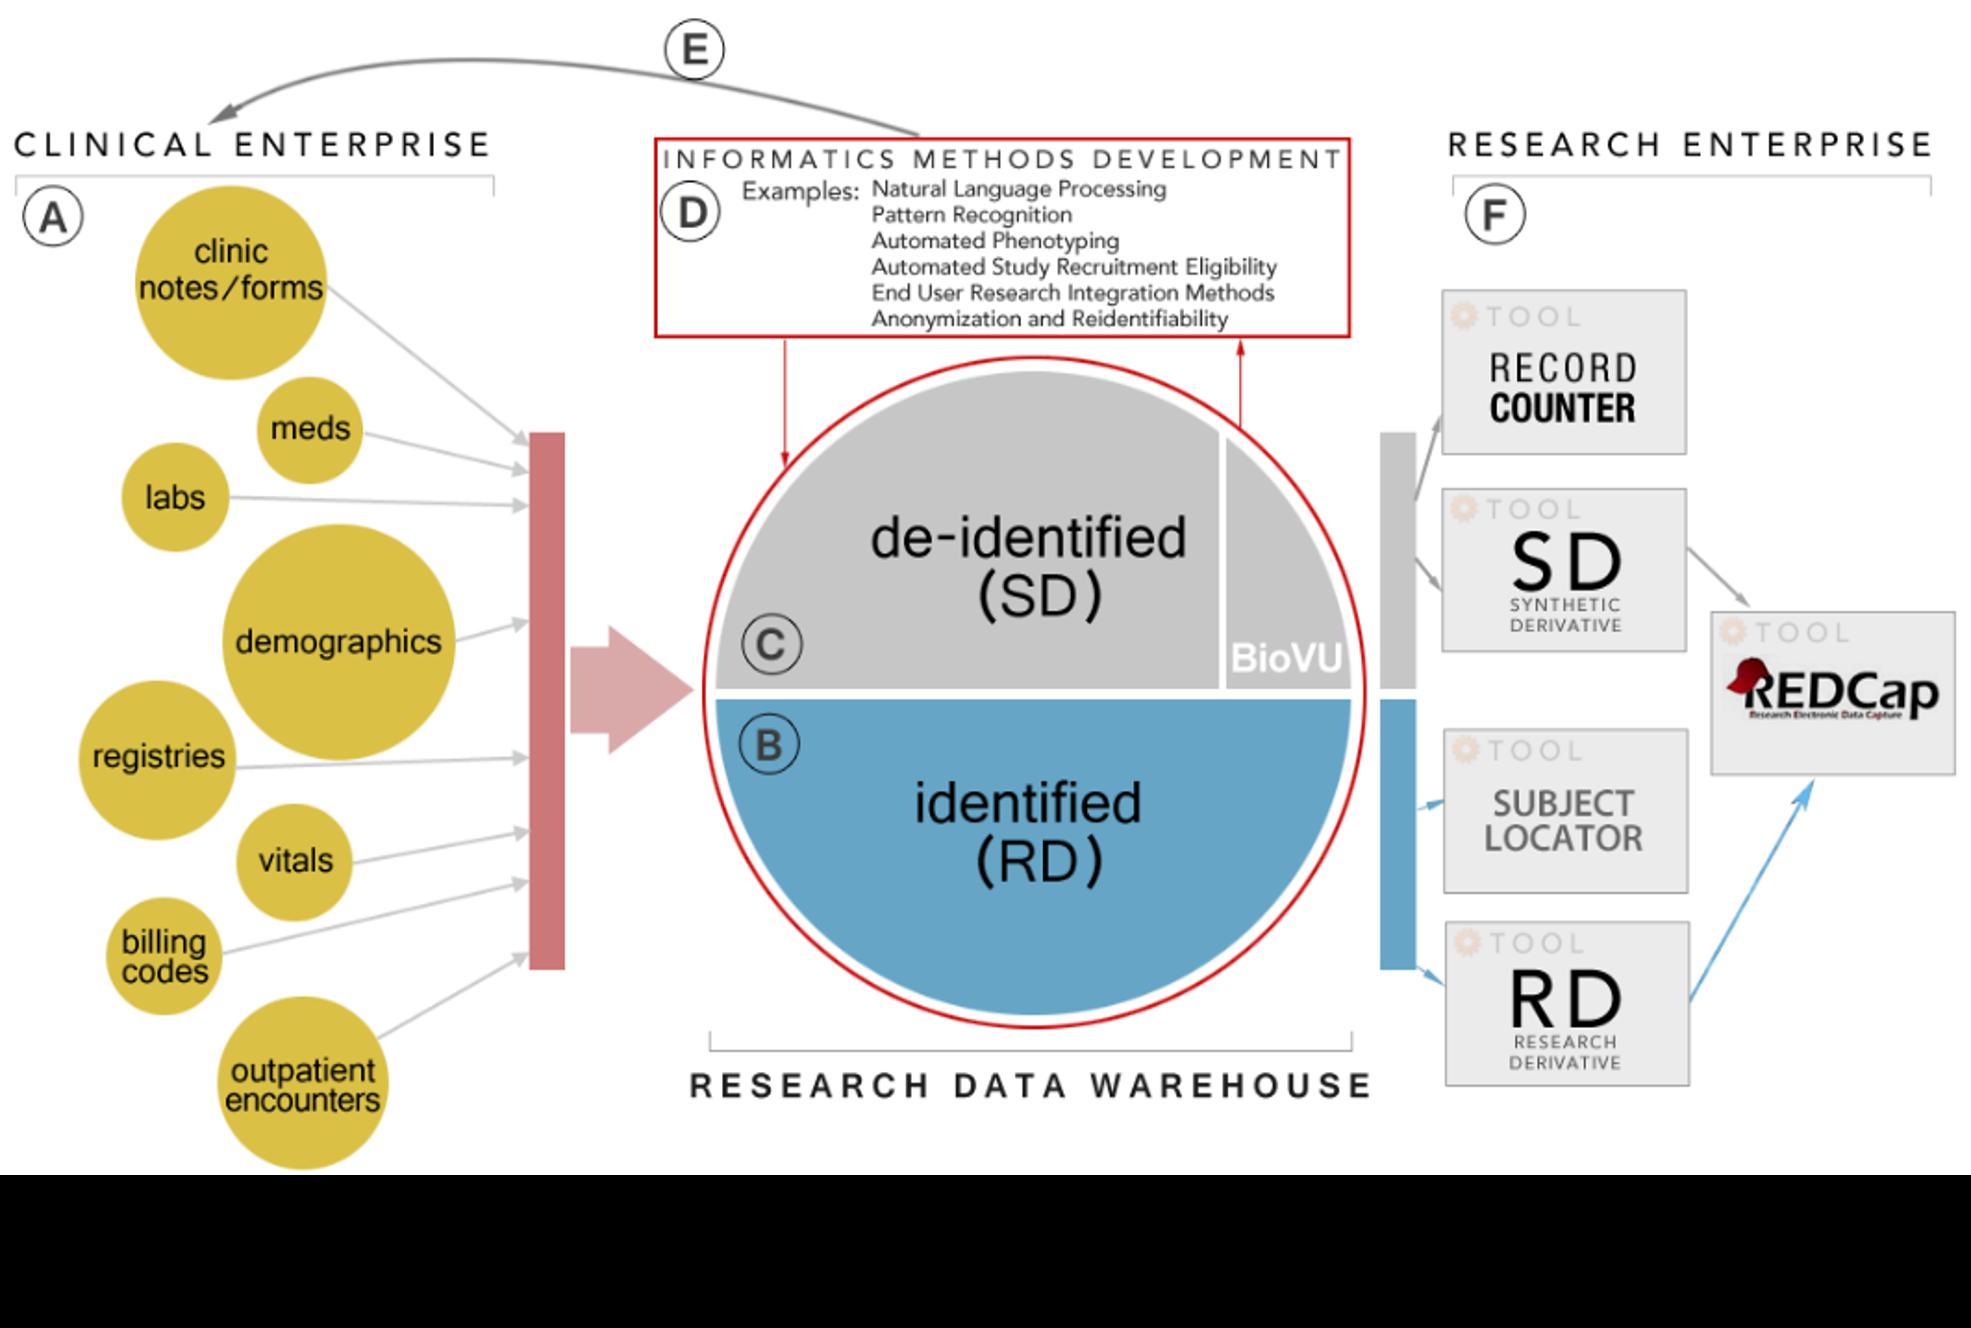 https://content.ilabsolutions.com/wp-content/uploads/2015/04/Research-Enterprise-Pic.png